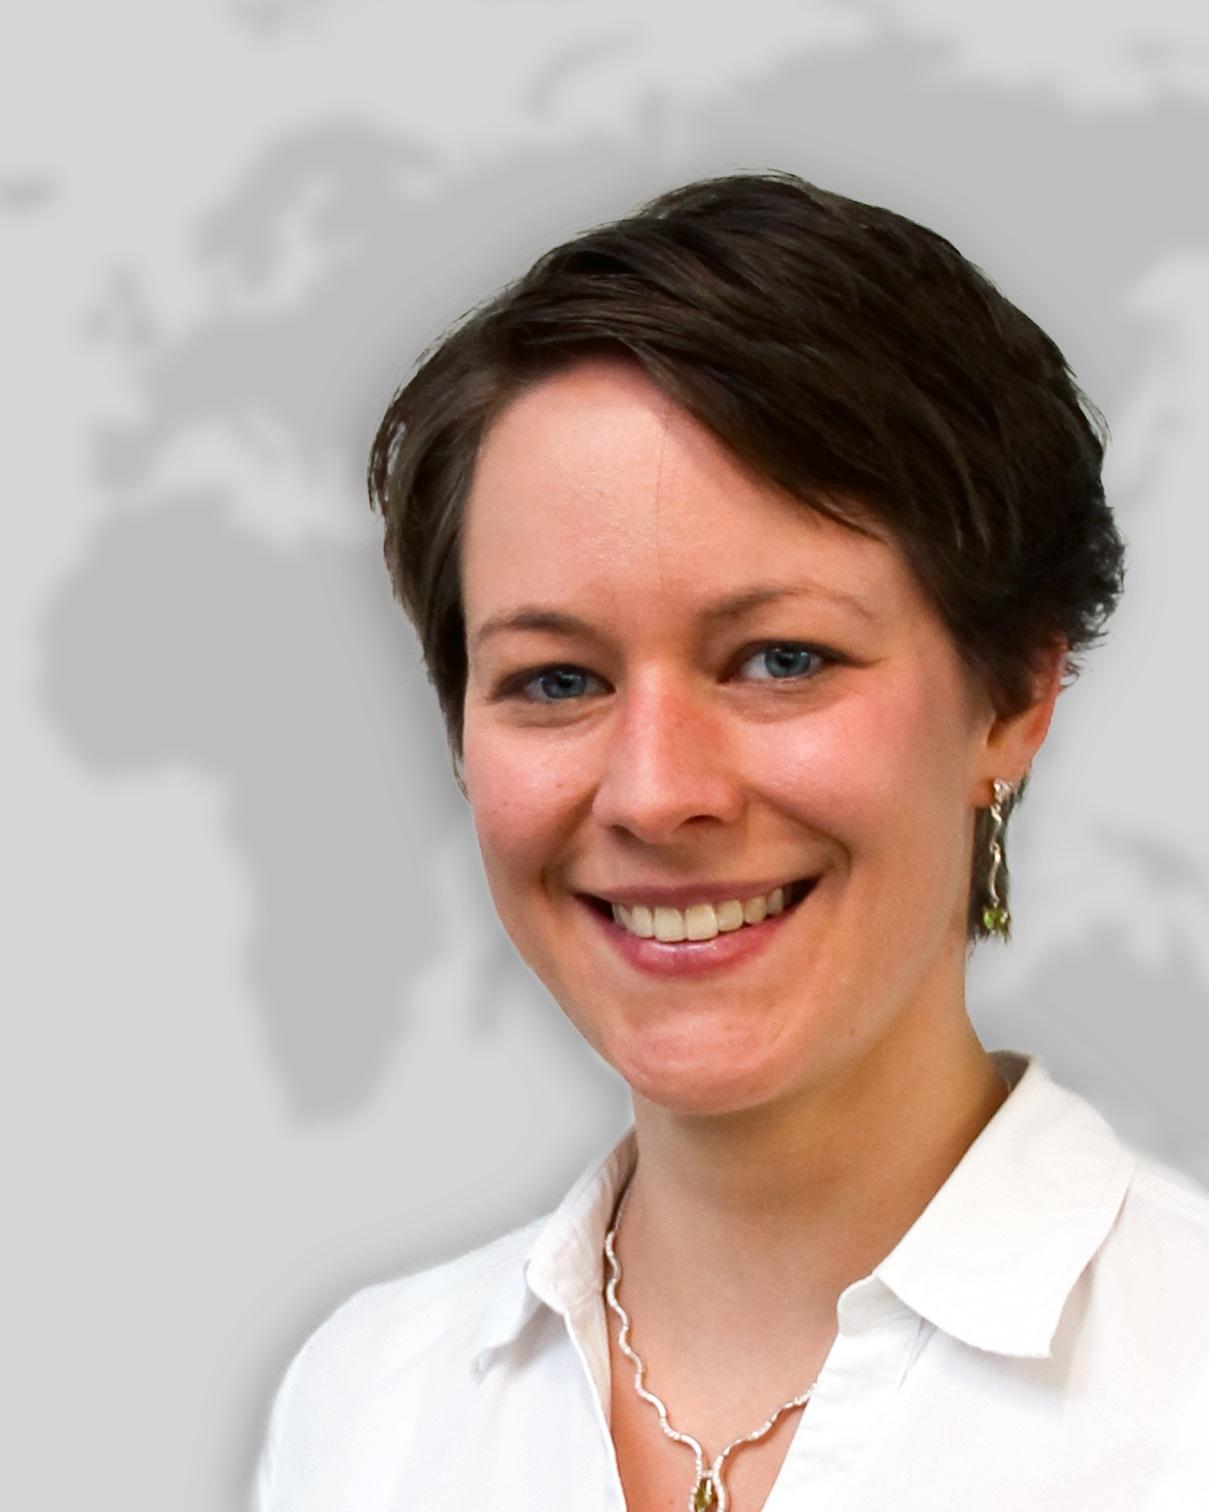 Melanie Stahl